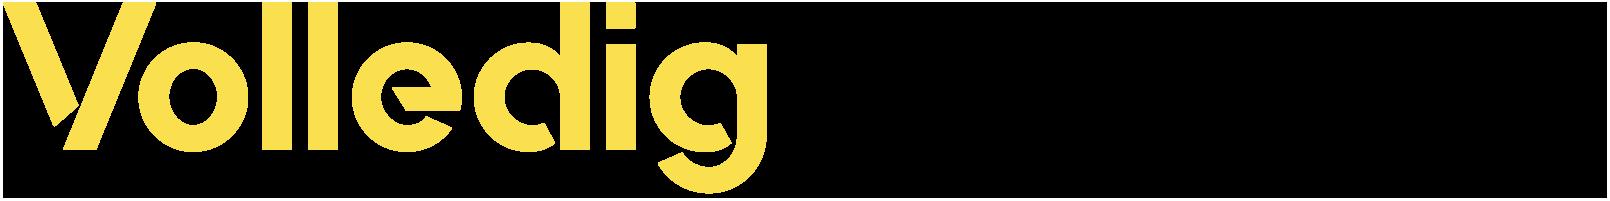 vzv-logo-2021-3